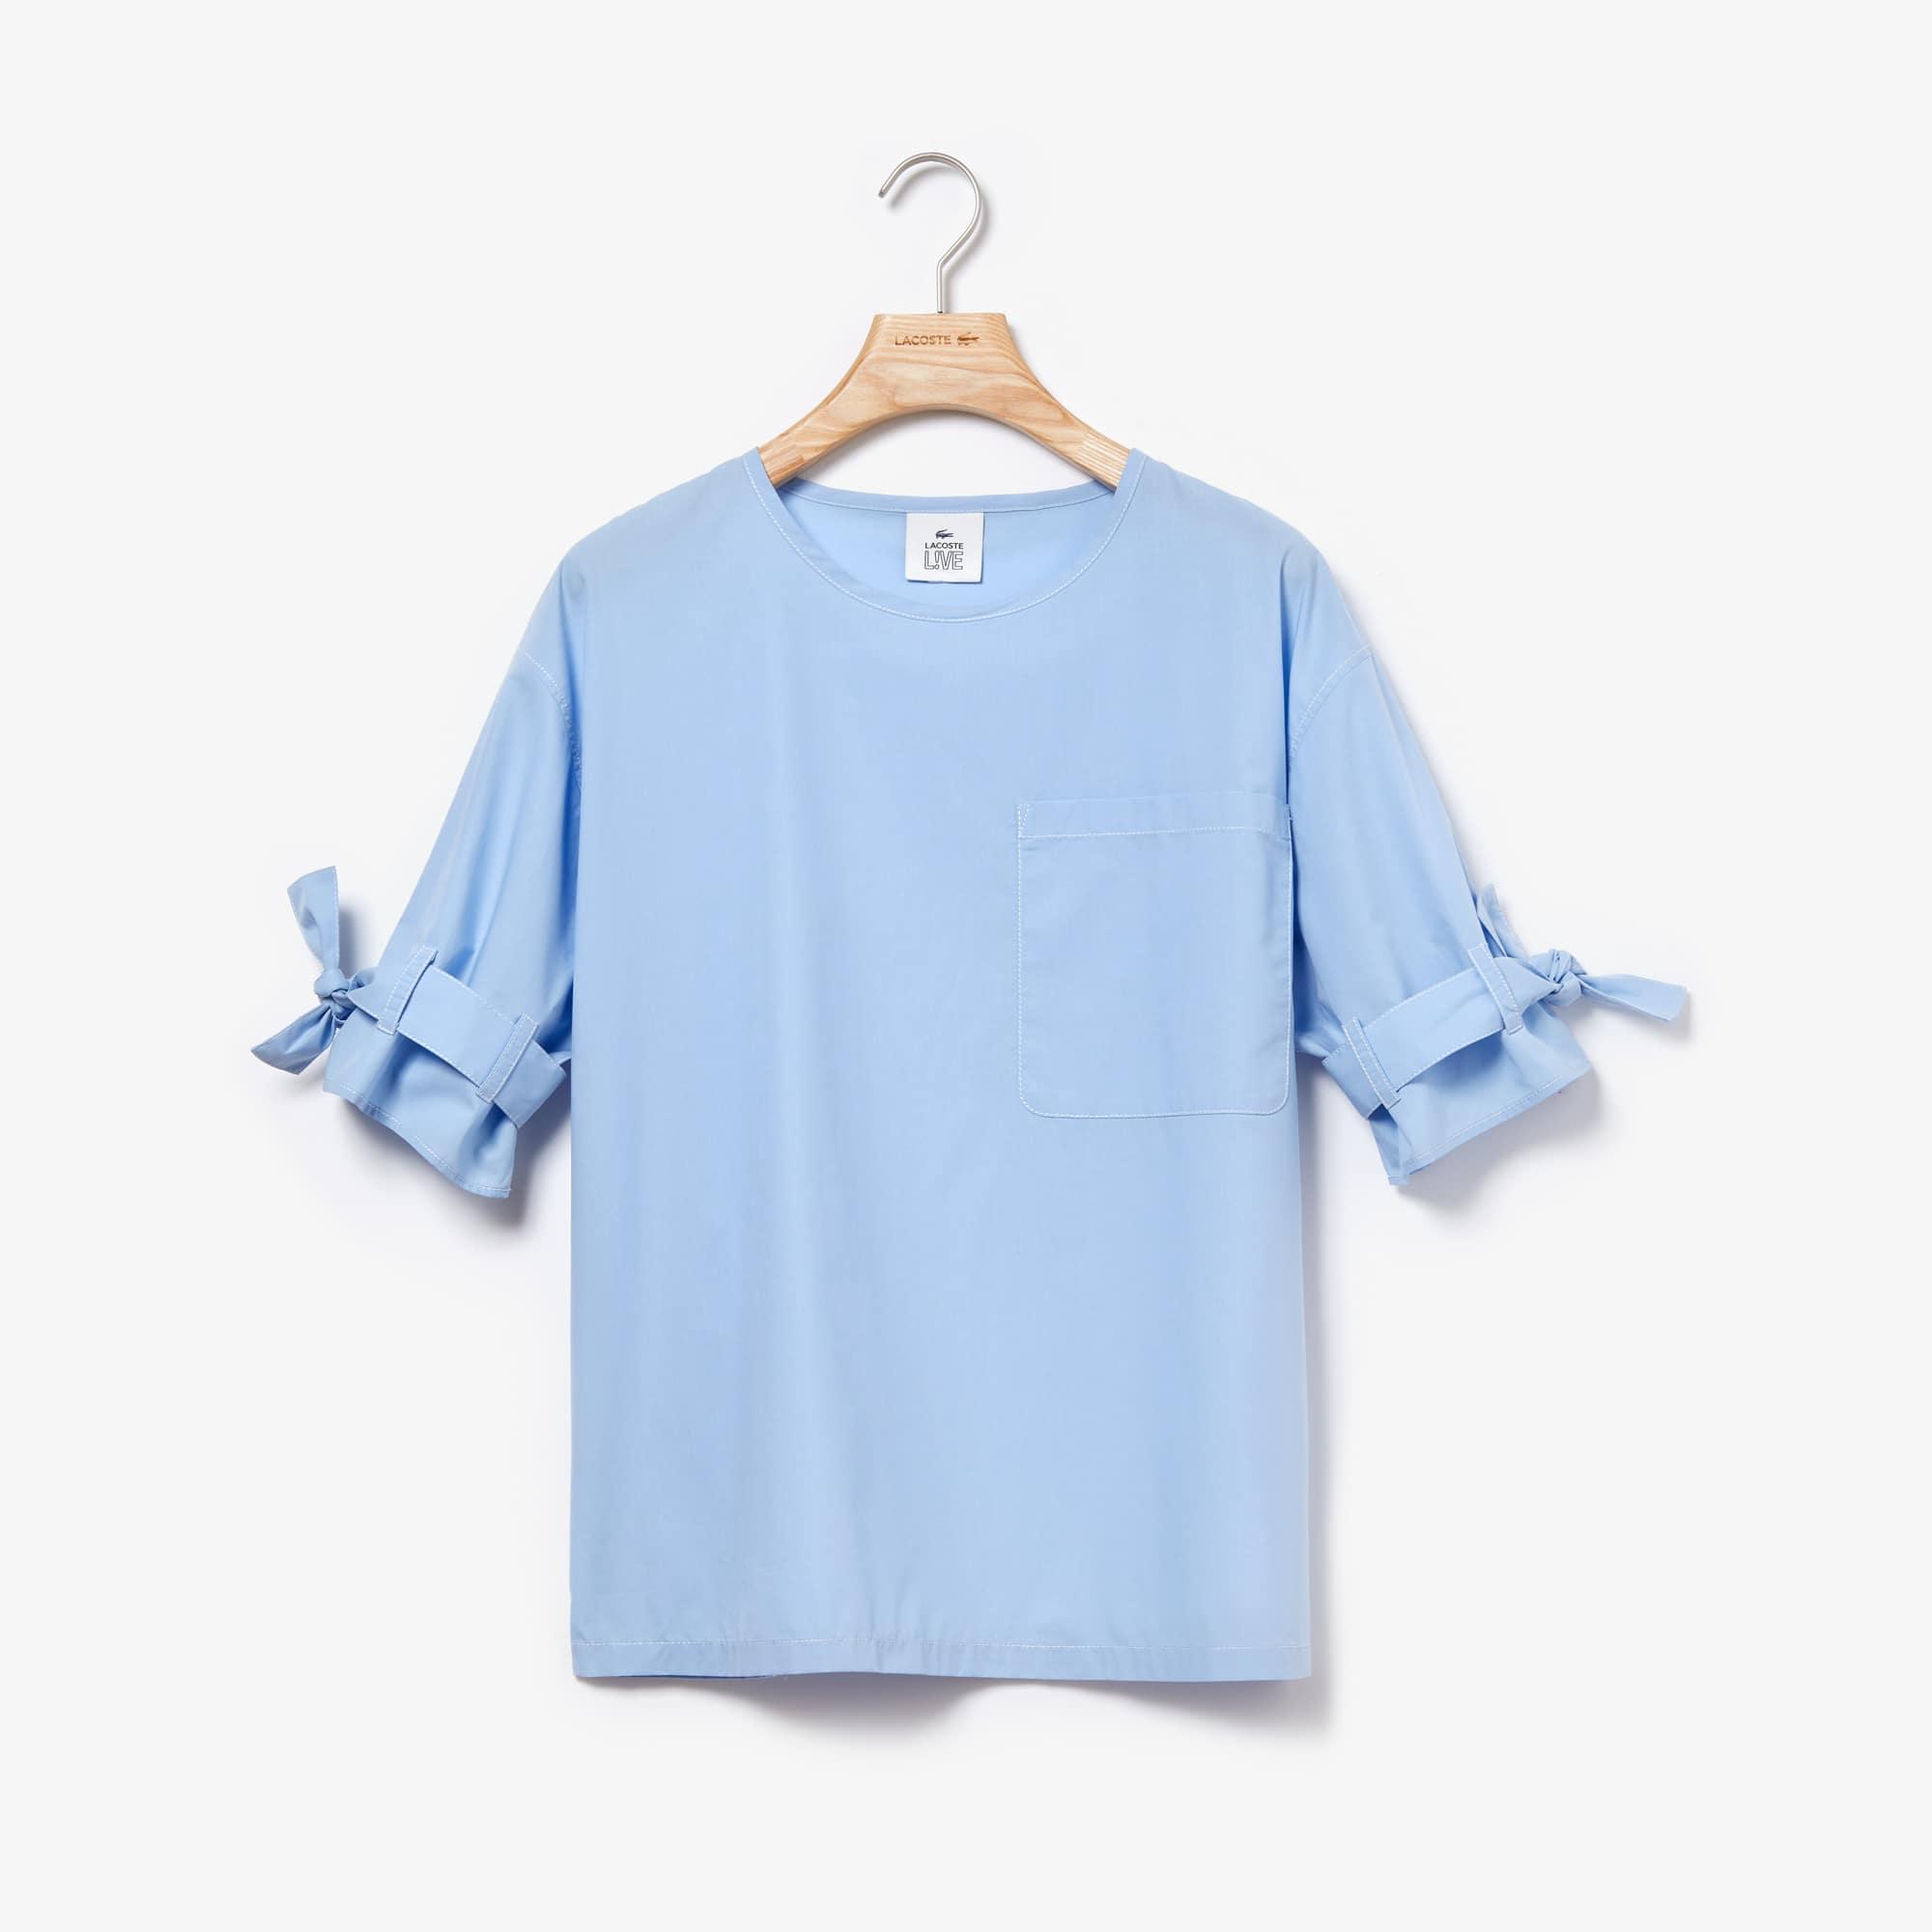 b6449f6f1 Blusa de popelina de algodão larga